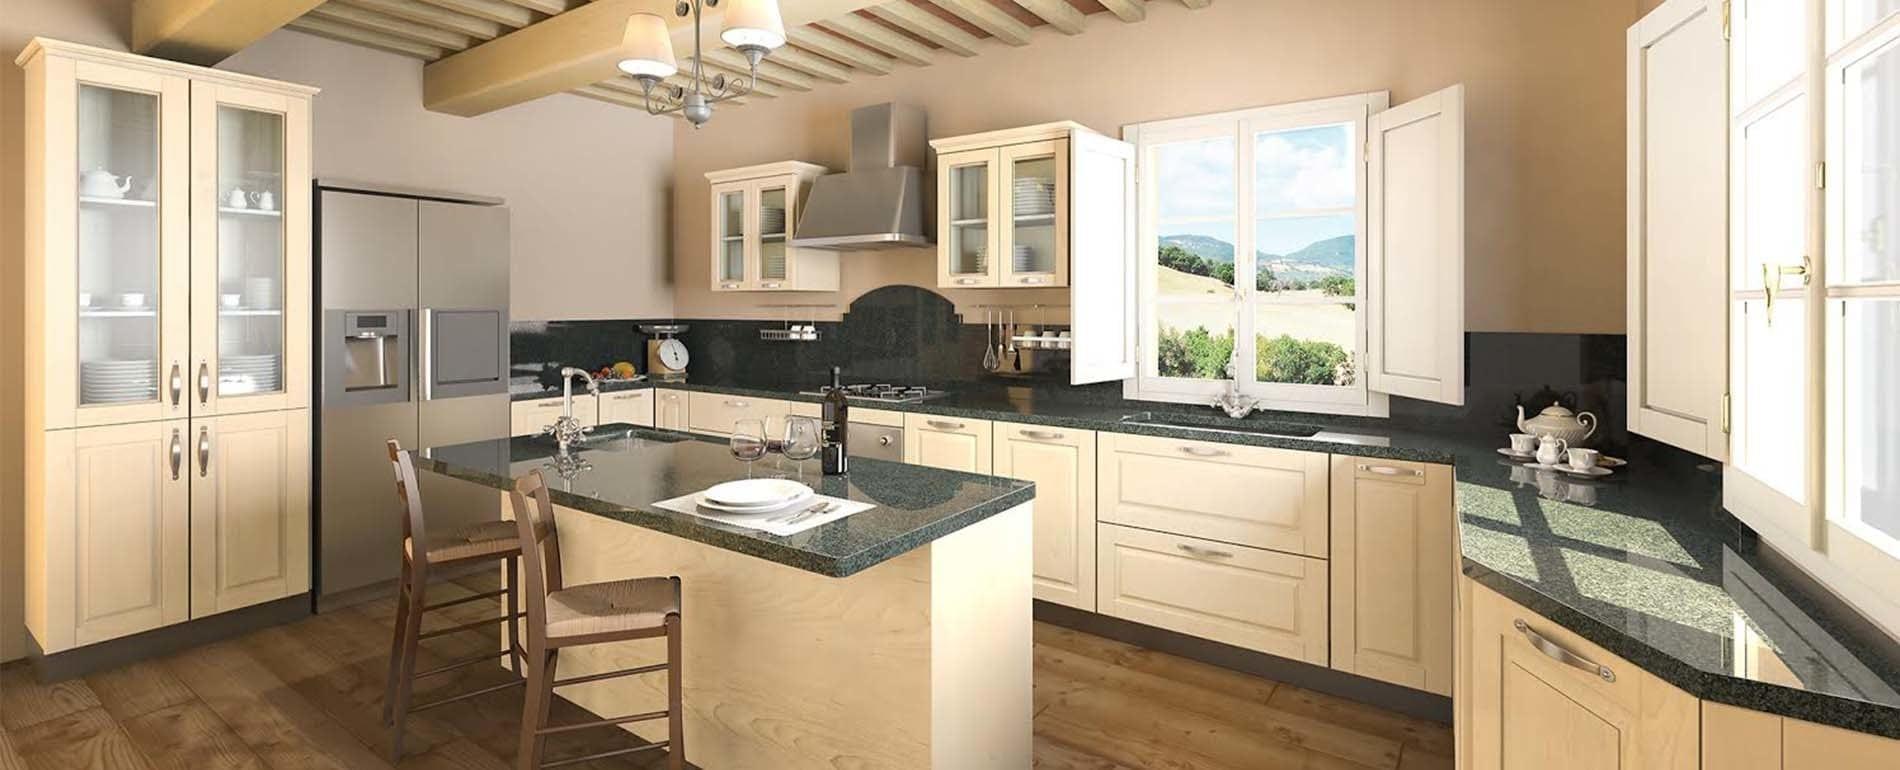 Cucine Classiche #90733B 1900 770 Arredamento Cucine Moderne E Classiche